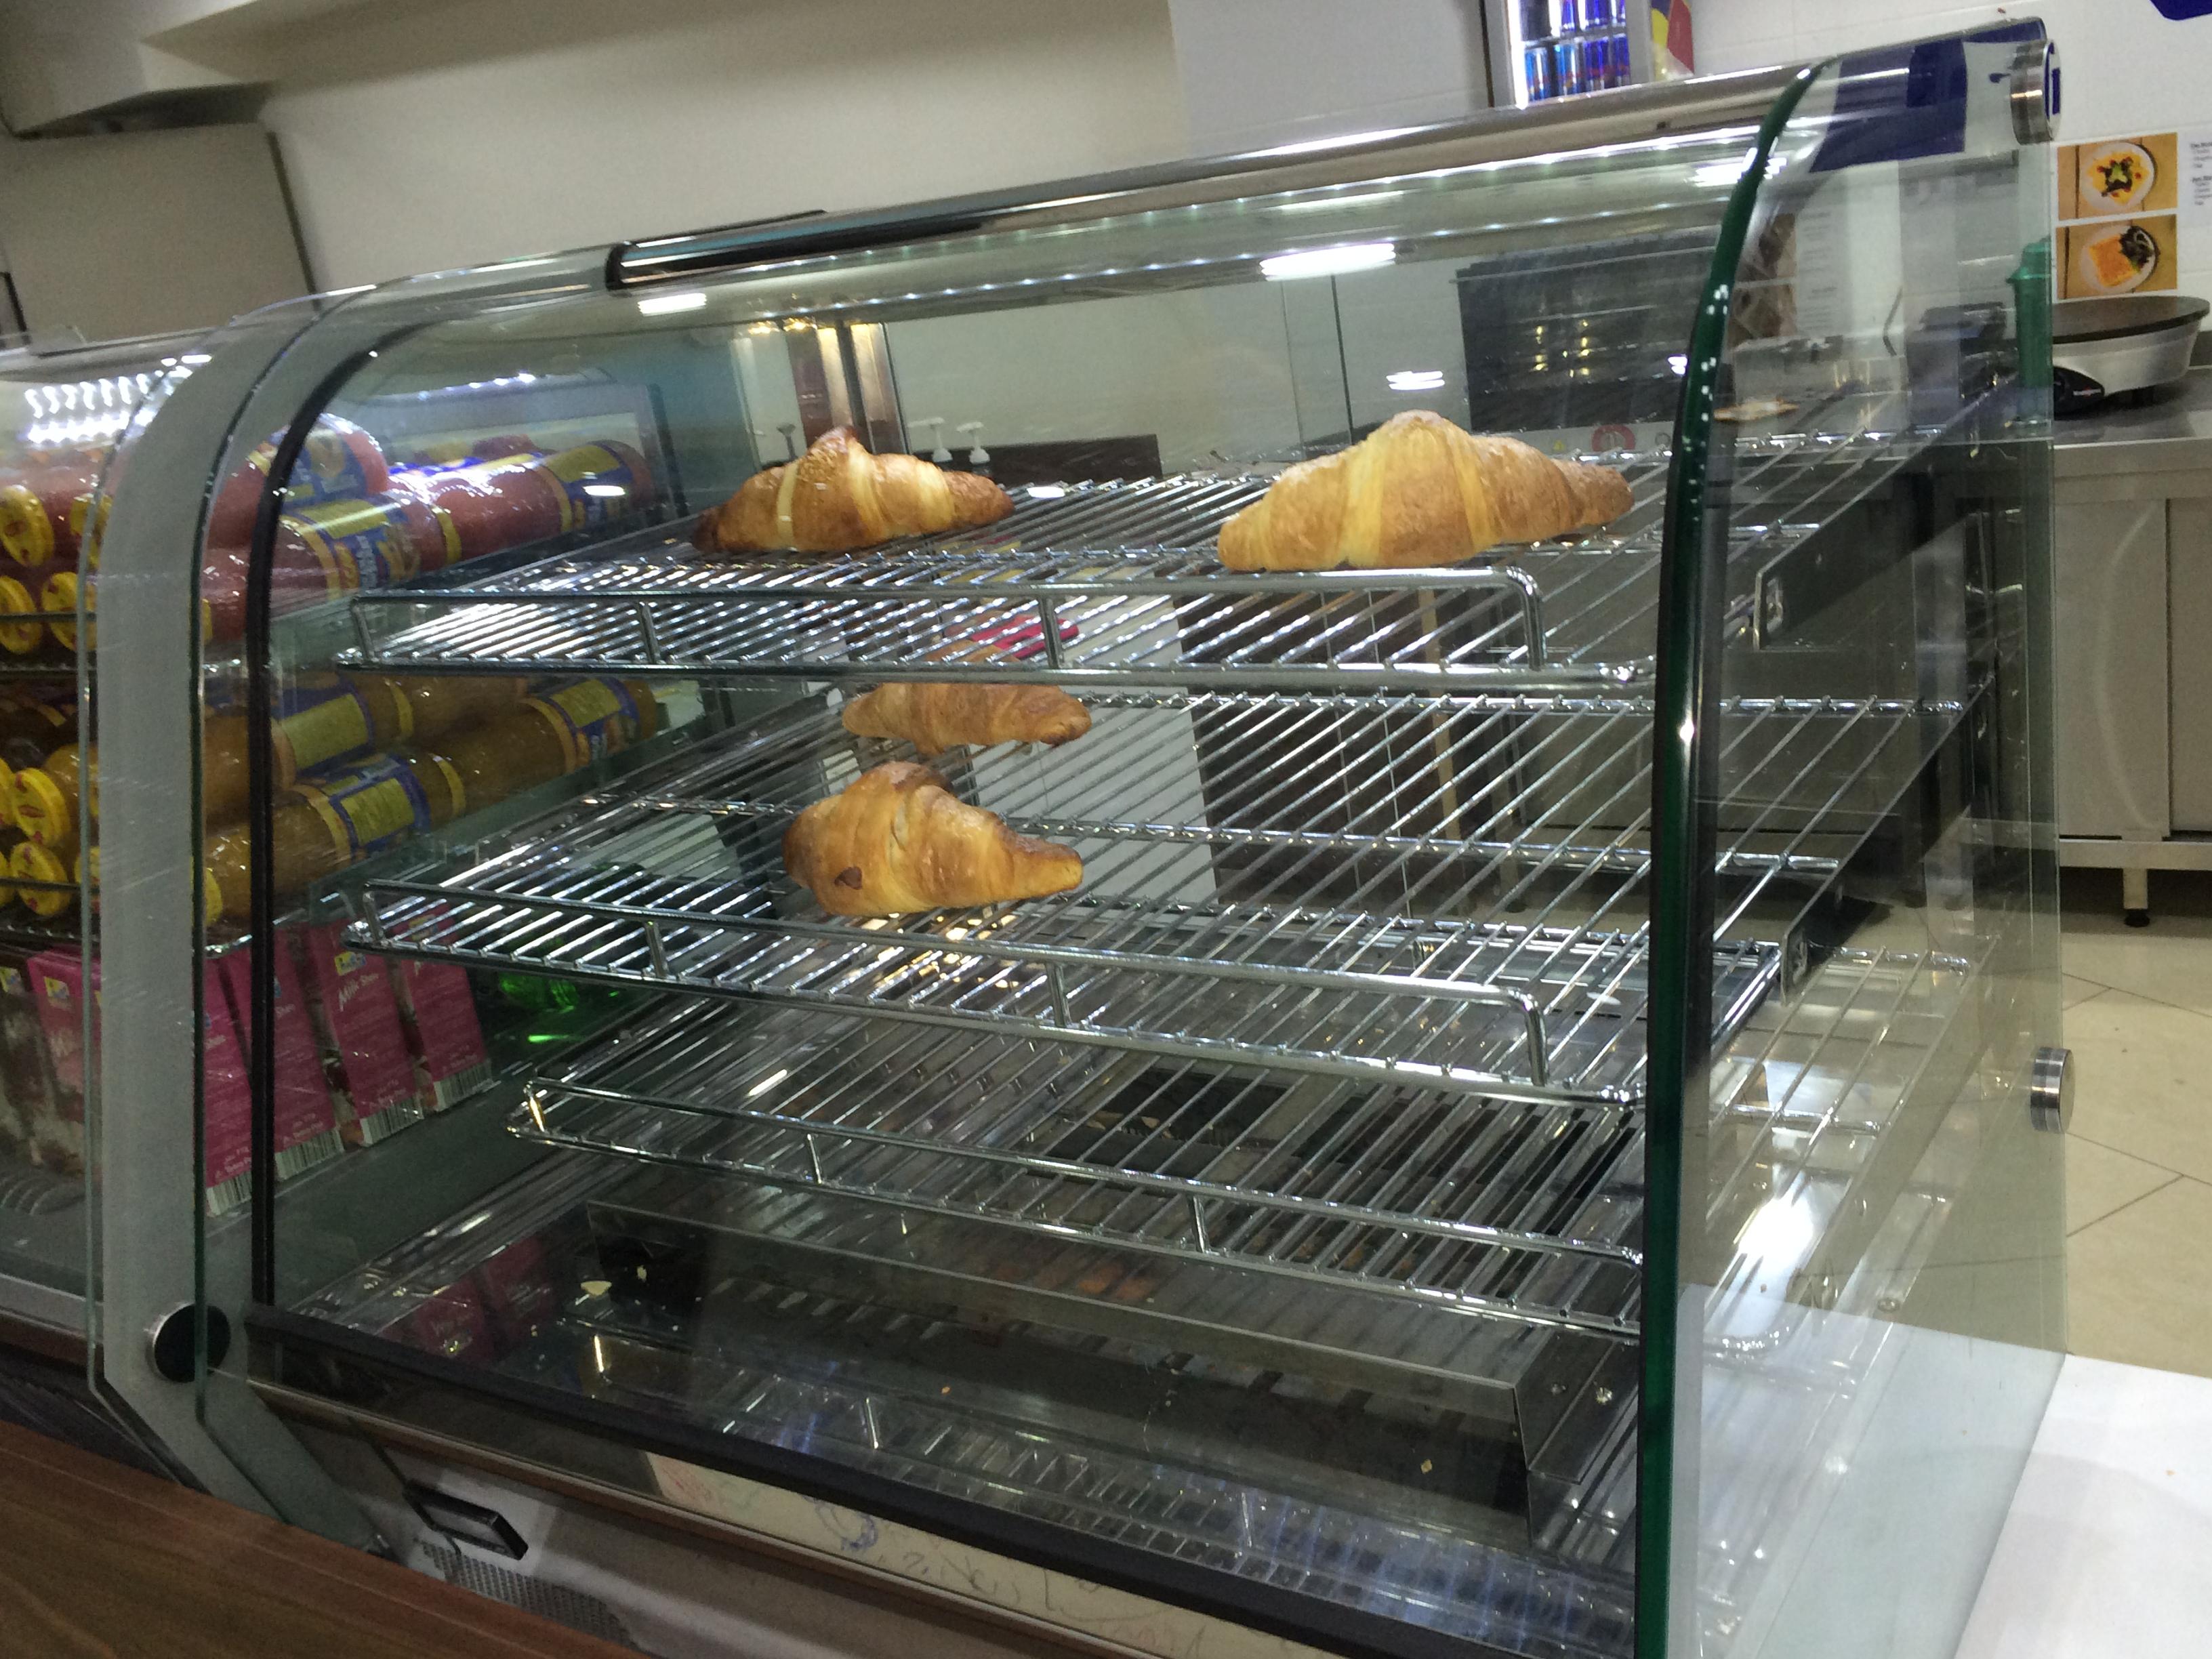 cafeteria croissant heater